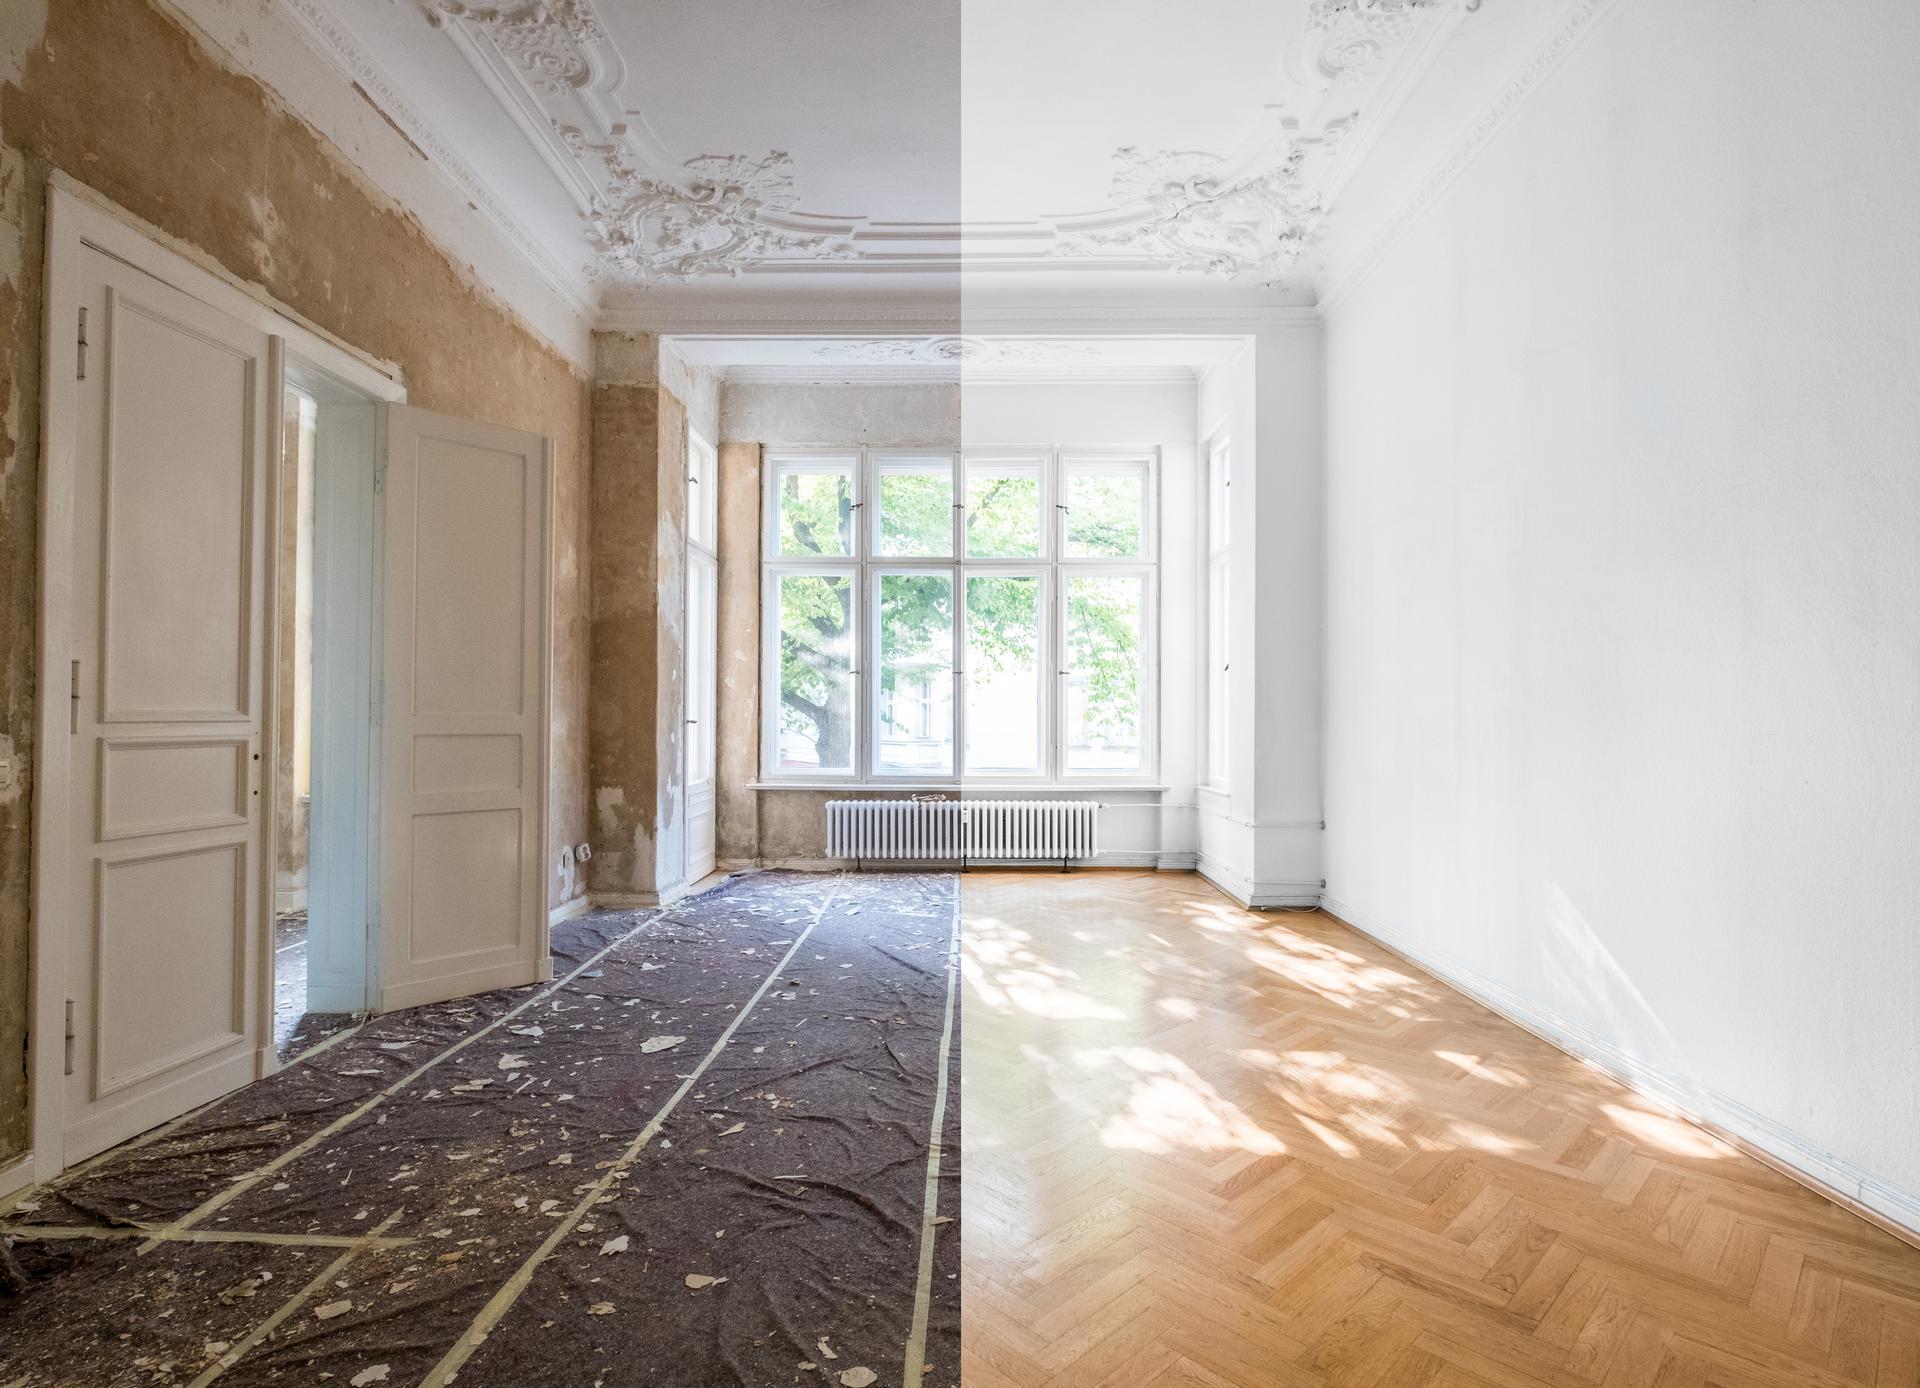 Restorations & Renovations of Historic Homes Main Photo